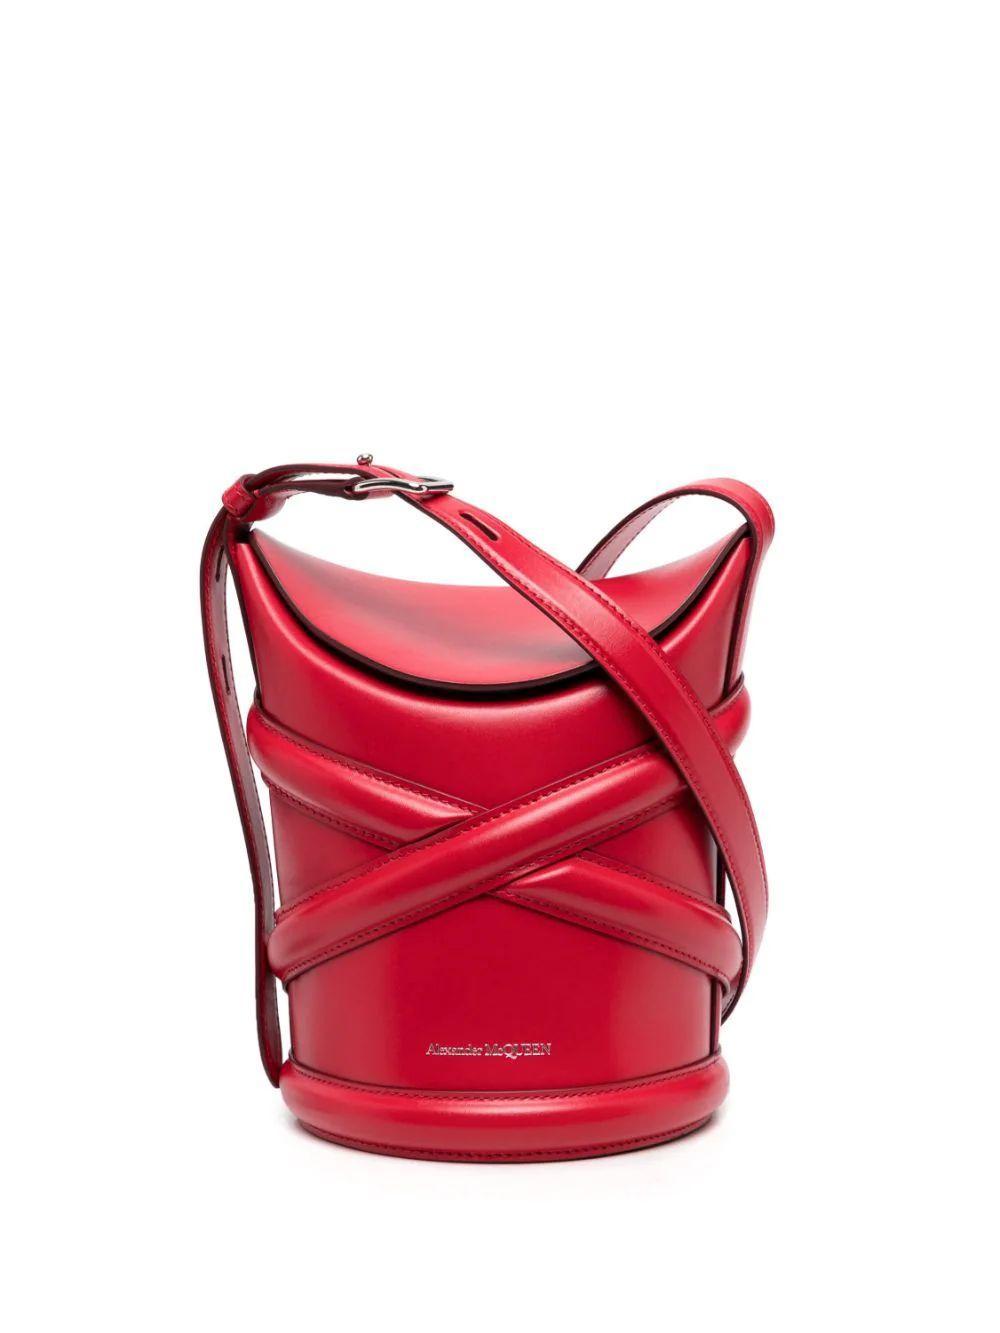 Small Curve Bag